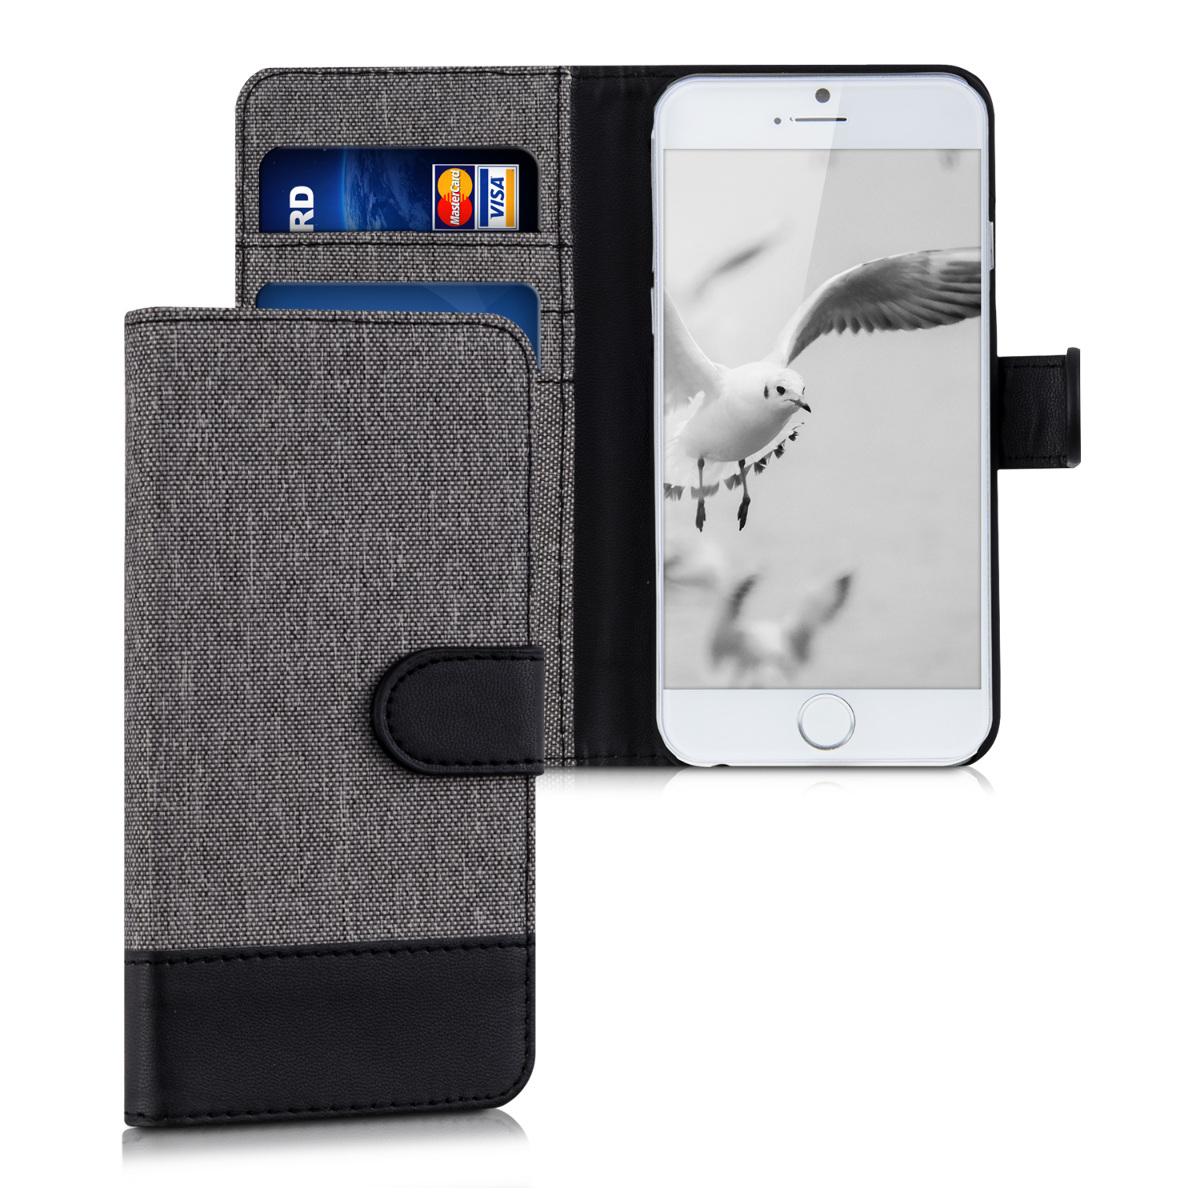 KW Θήκη Πορτοφόλι Apple iPhone 6 / 6S - Grey / Black (35220.22)